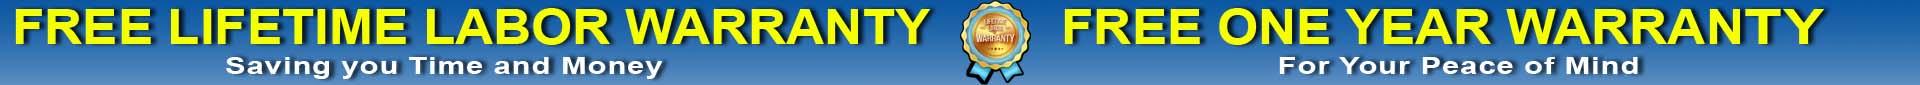 Free Lifetime Warranty and Free One Year Warranty